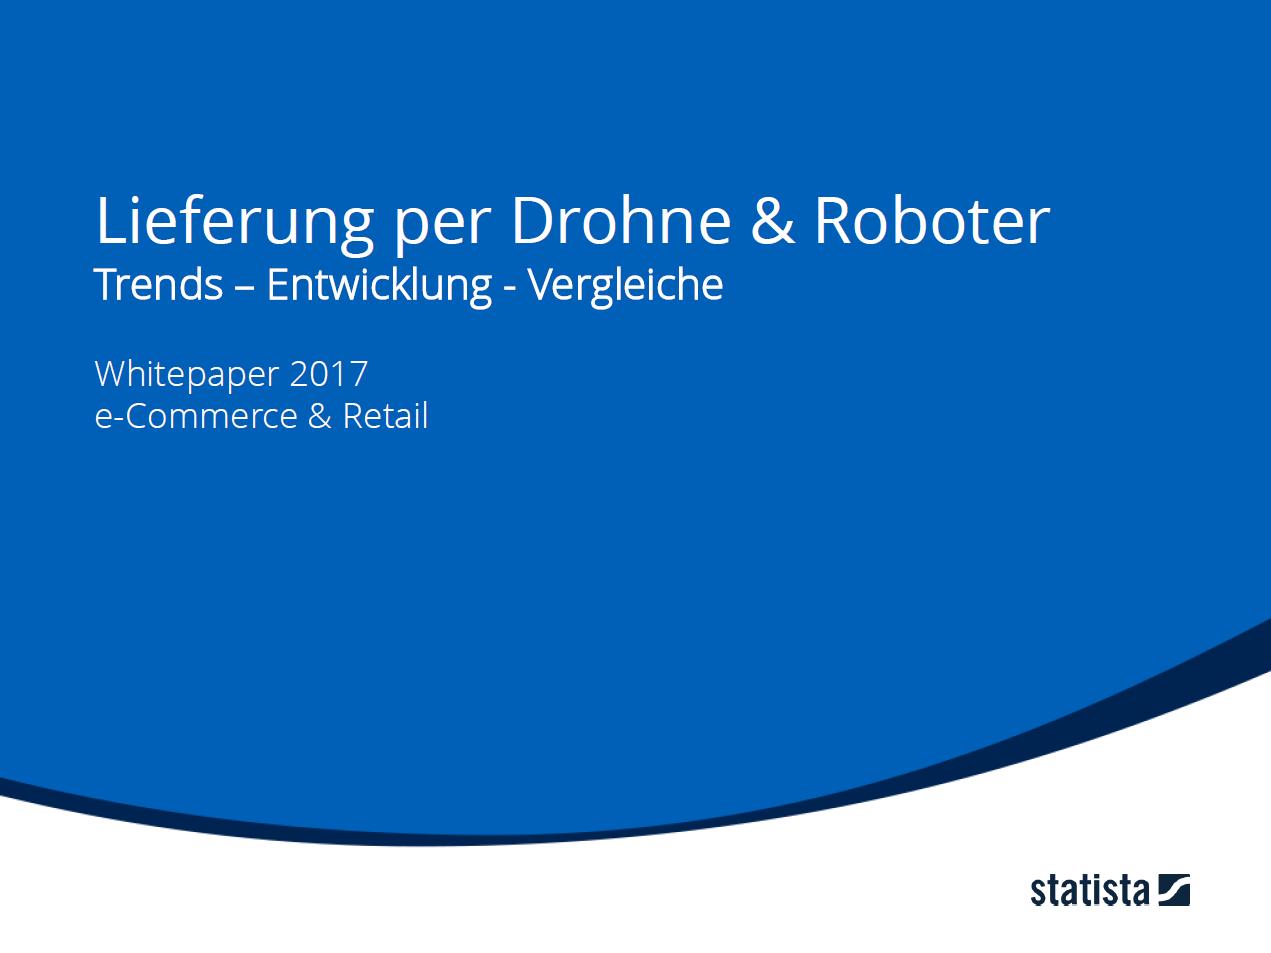 Lieferung per Drohne & Roboter: Trends – Entwicklung - Vergleiche